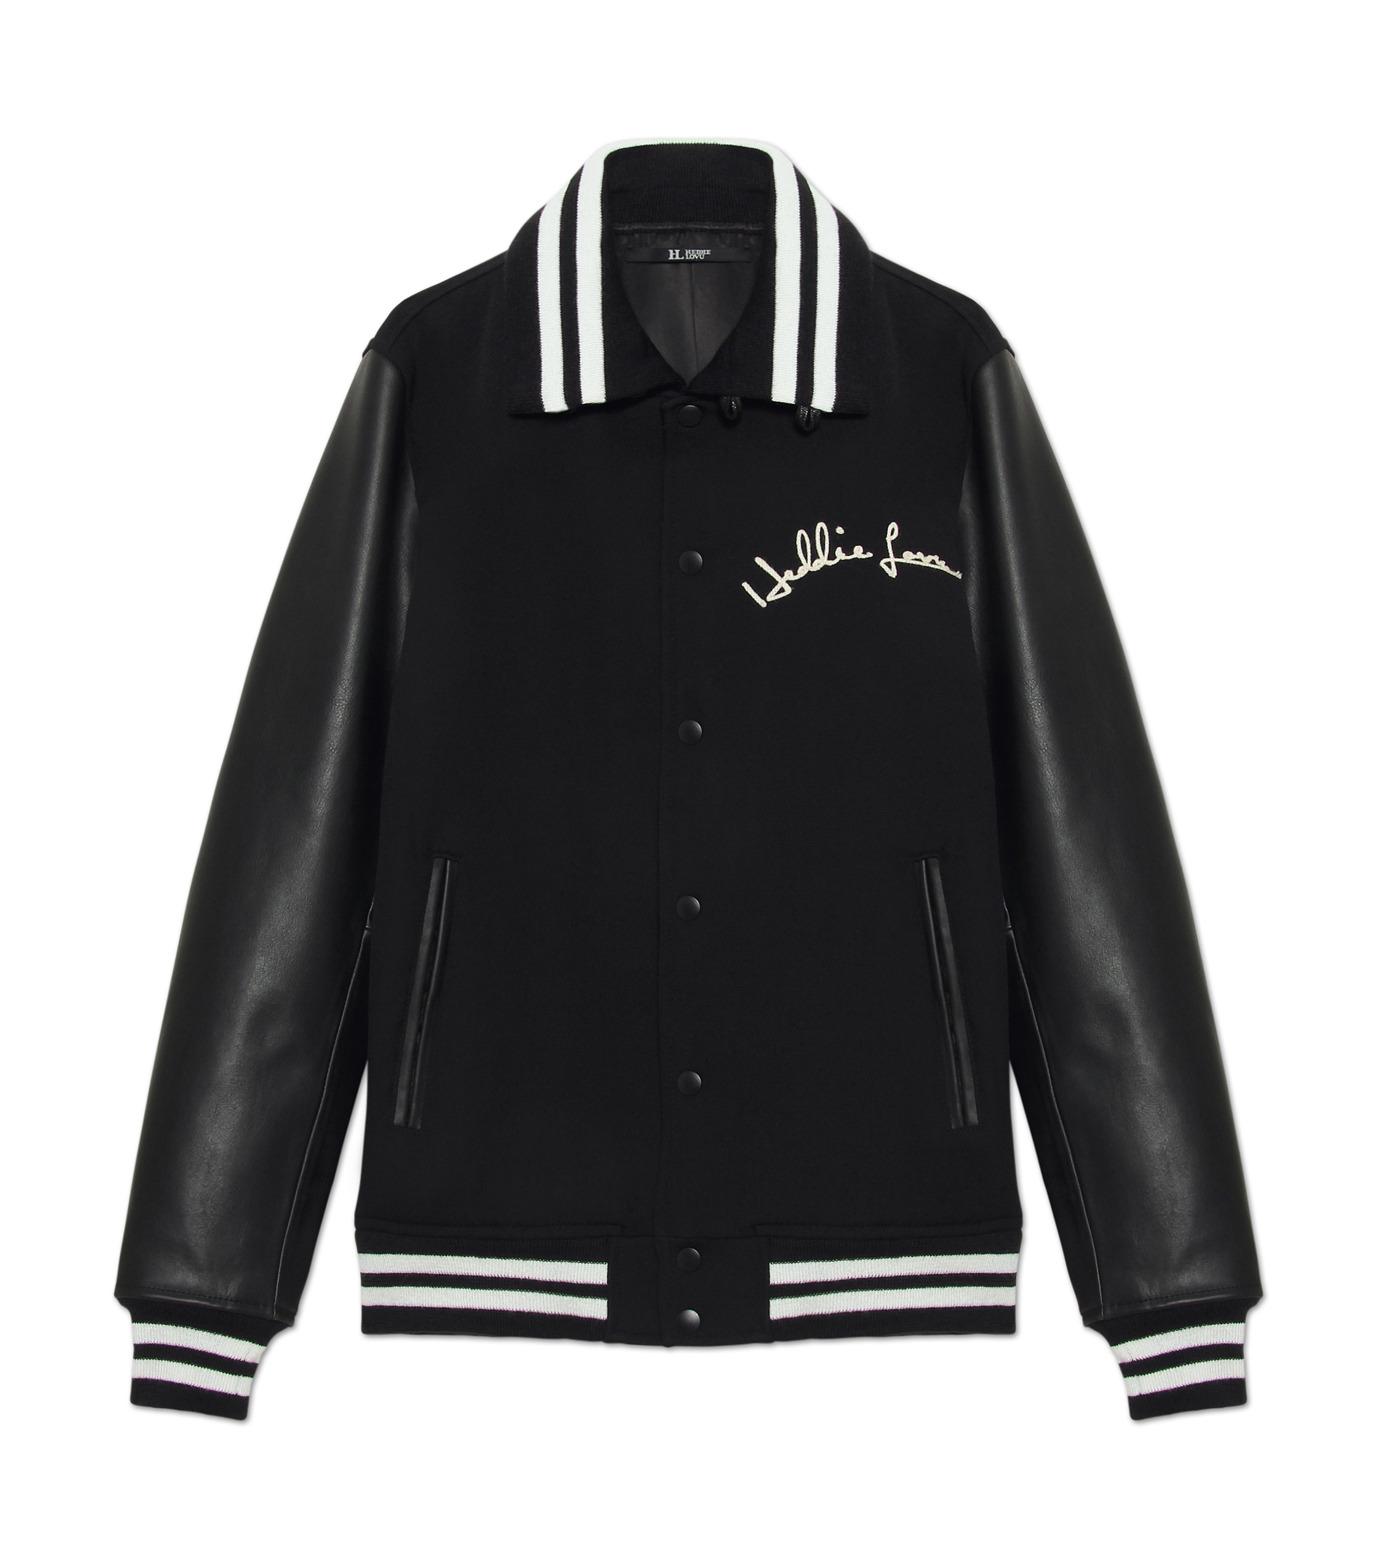 HL HEDDIE LOVU(エイチエル・エディールーヴ)のSTADIUM JACKET-BLACK(ジャケット/jacket)-18S94002-13 拡大詳細画像4